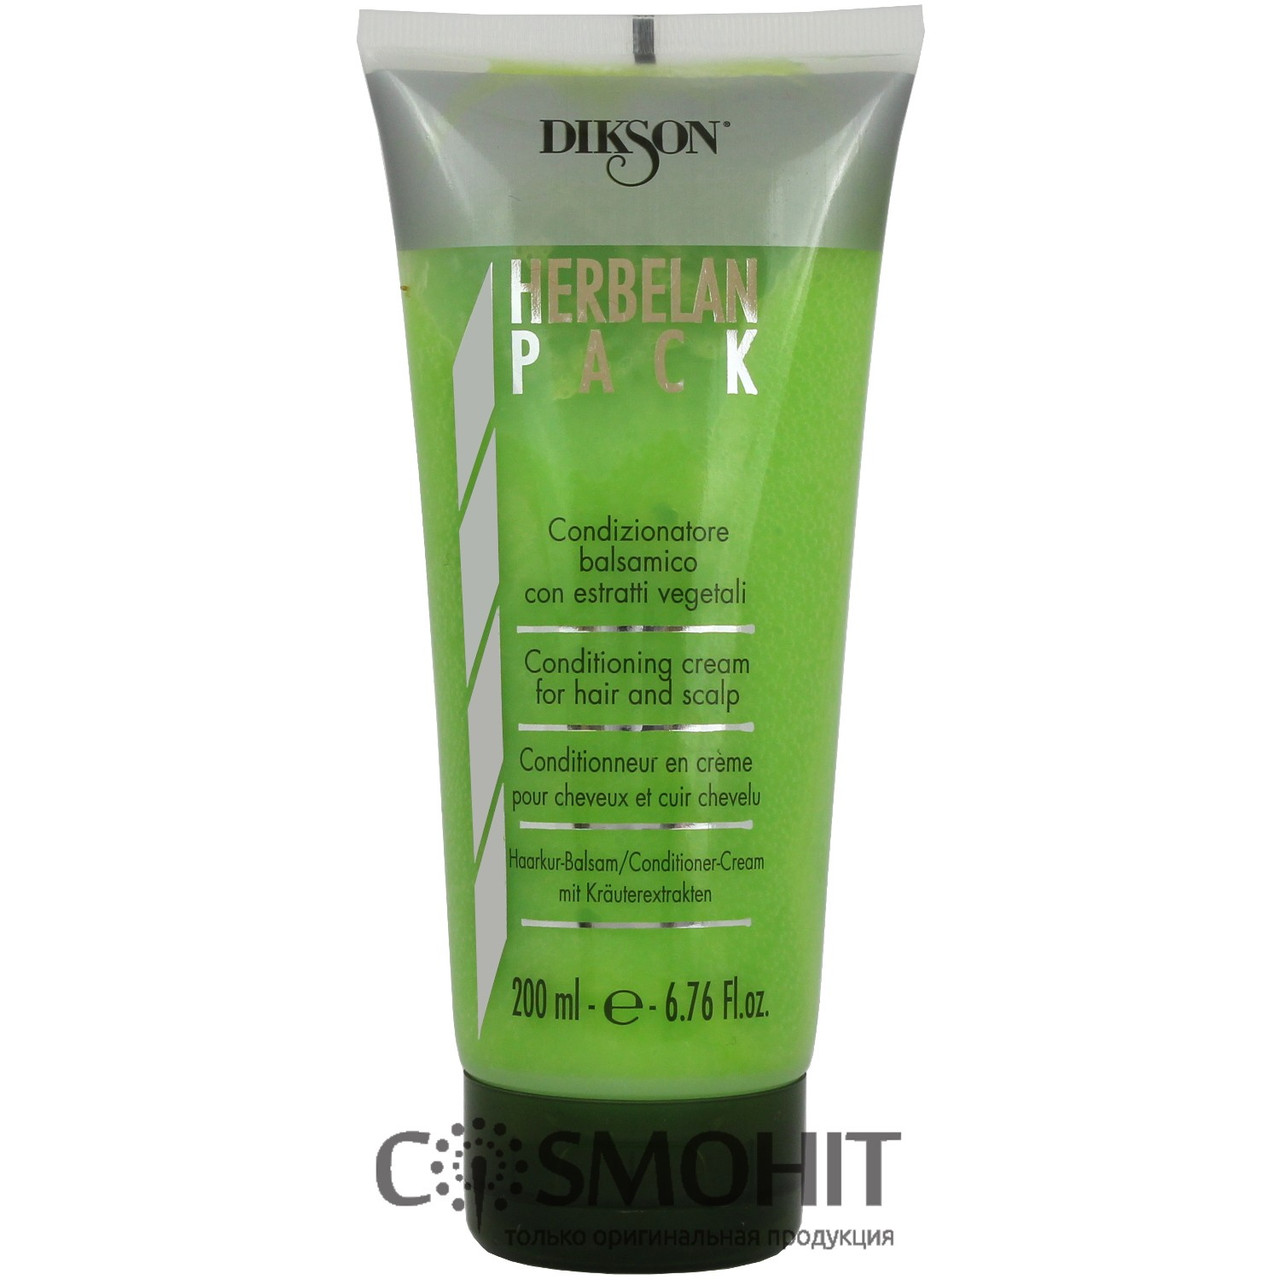 Dikson Herbelan Pack - Растительный бальзам, 200 ml